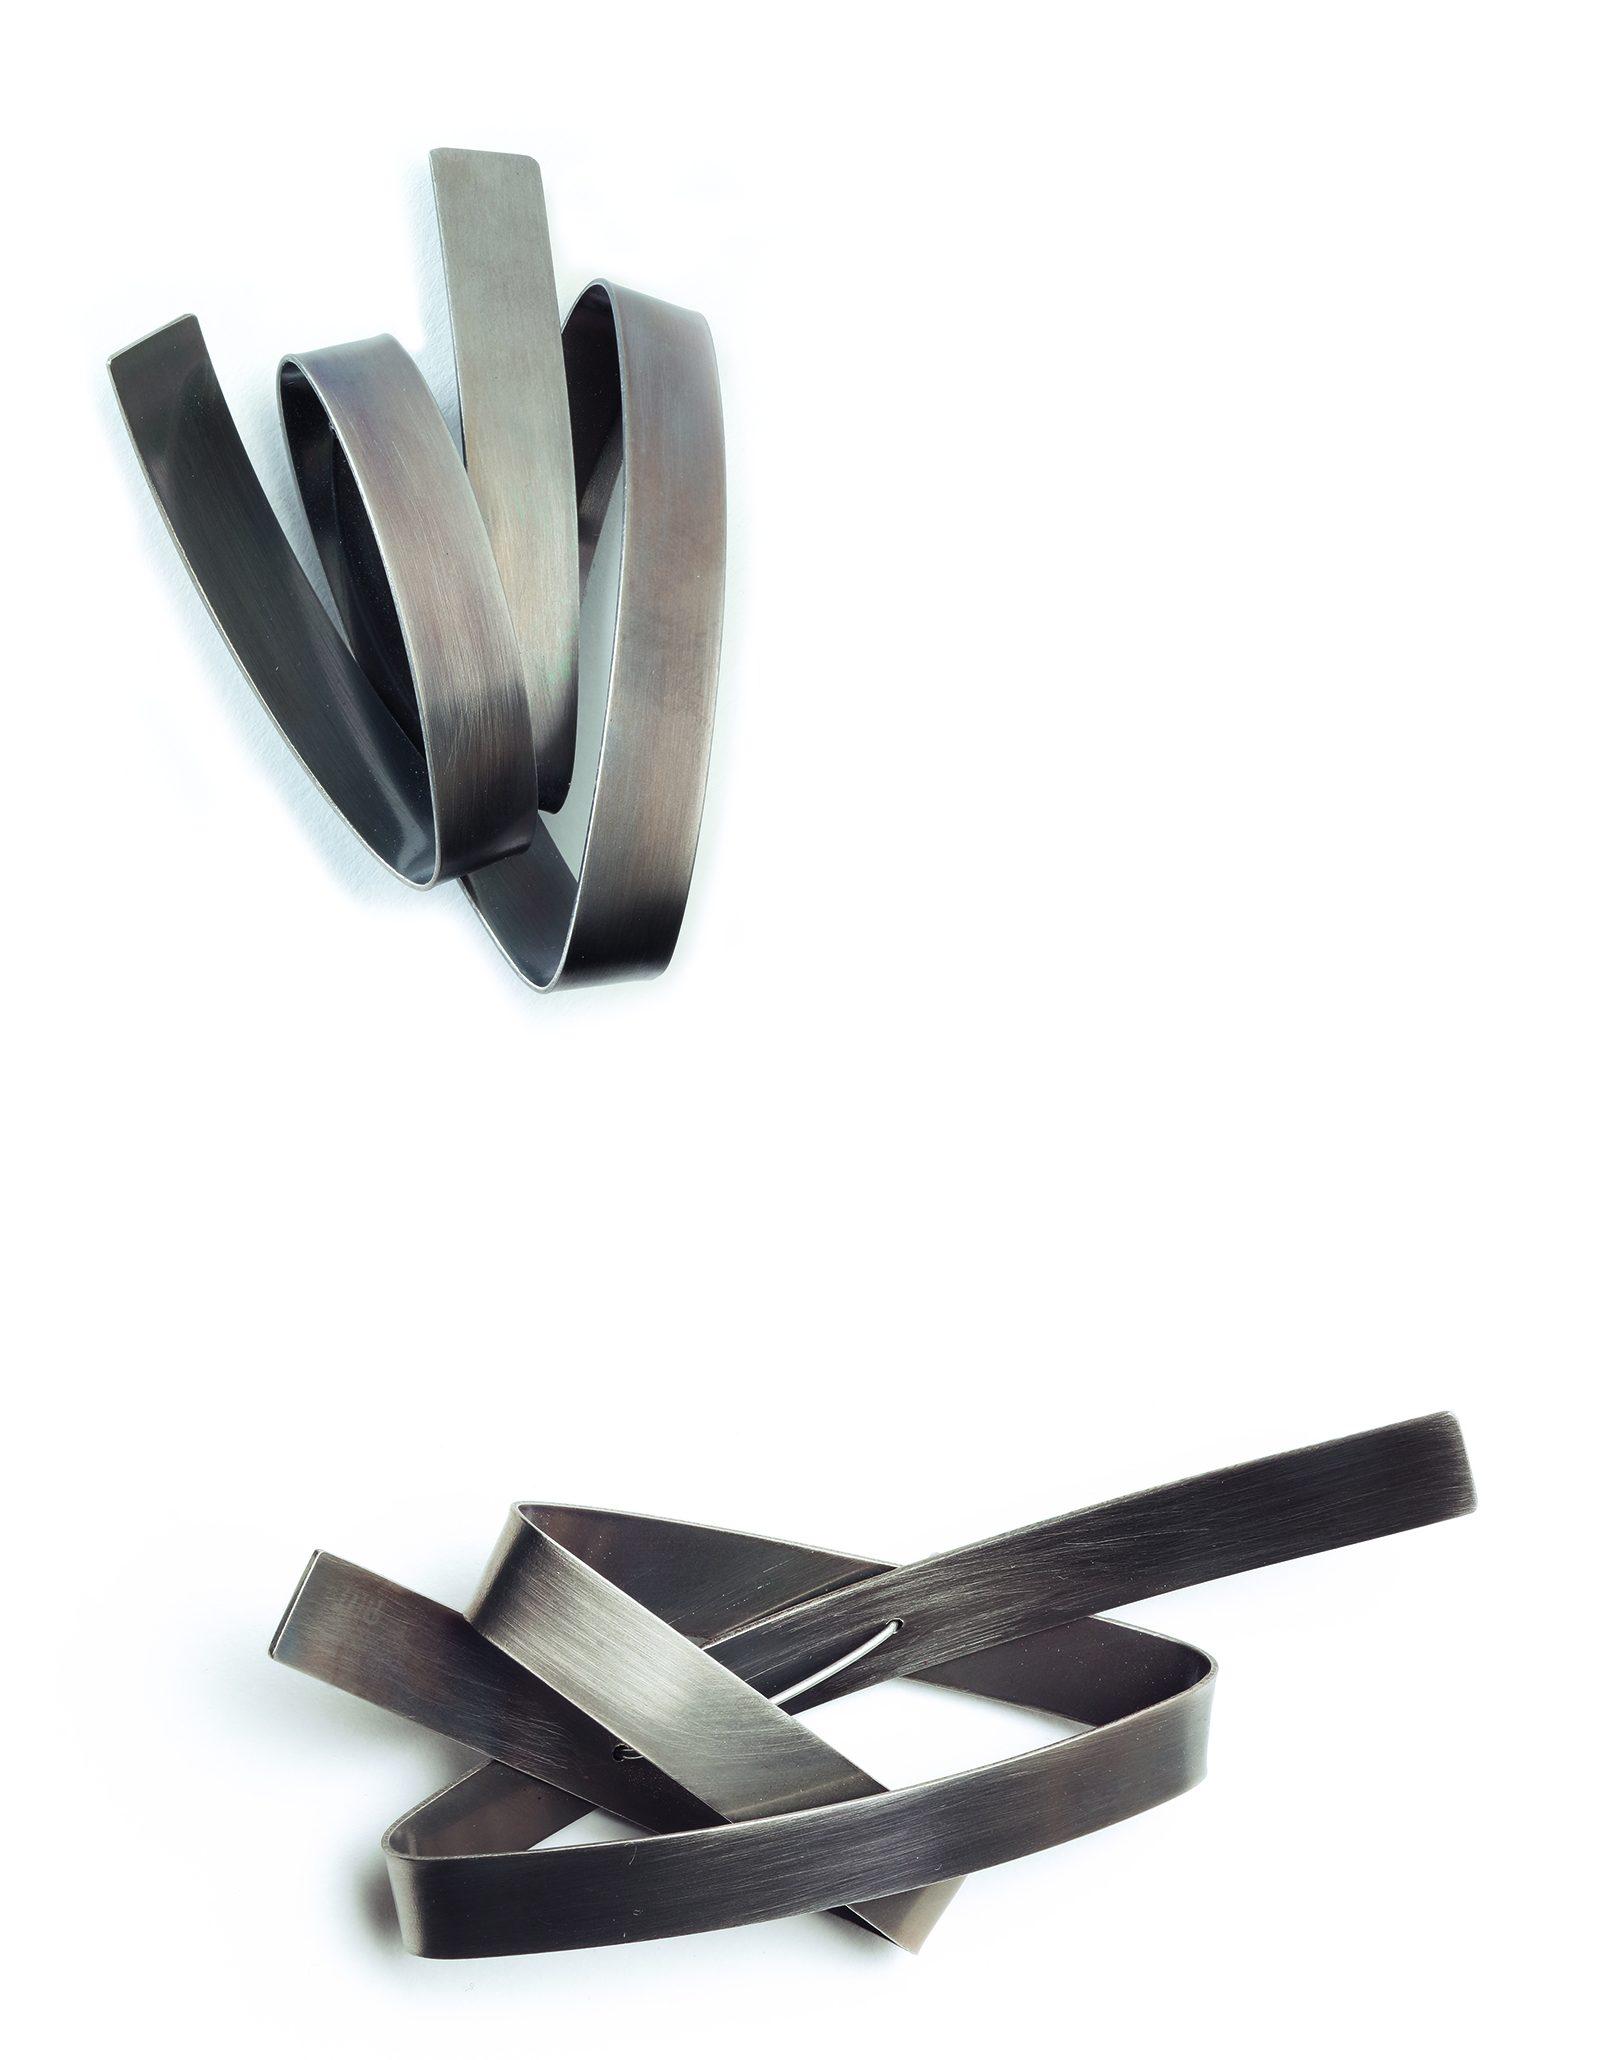 Silke Trekel, Knoten/Knot en Wächter/Guardian, broches, 2017. Foto Christoph Sandig, titanium